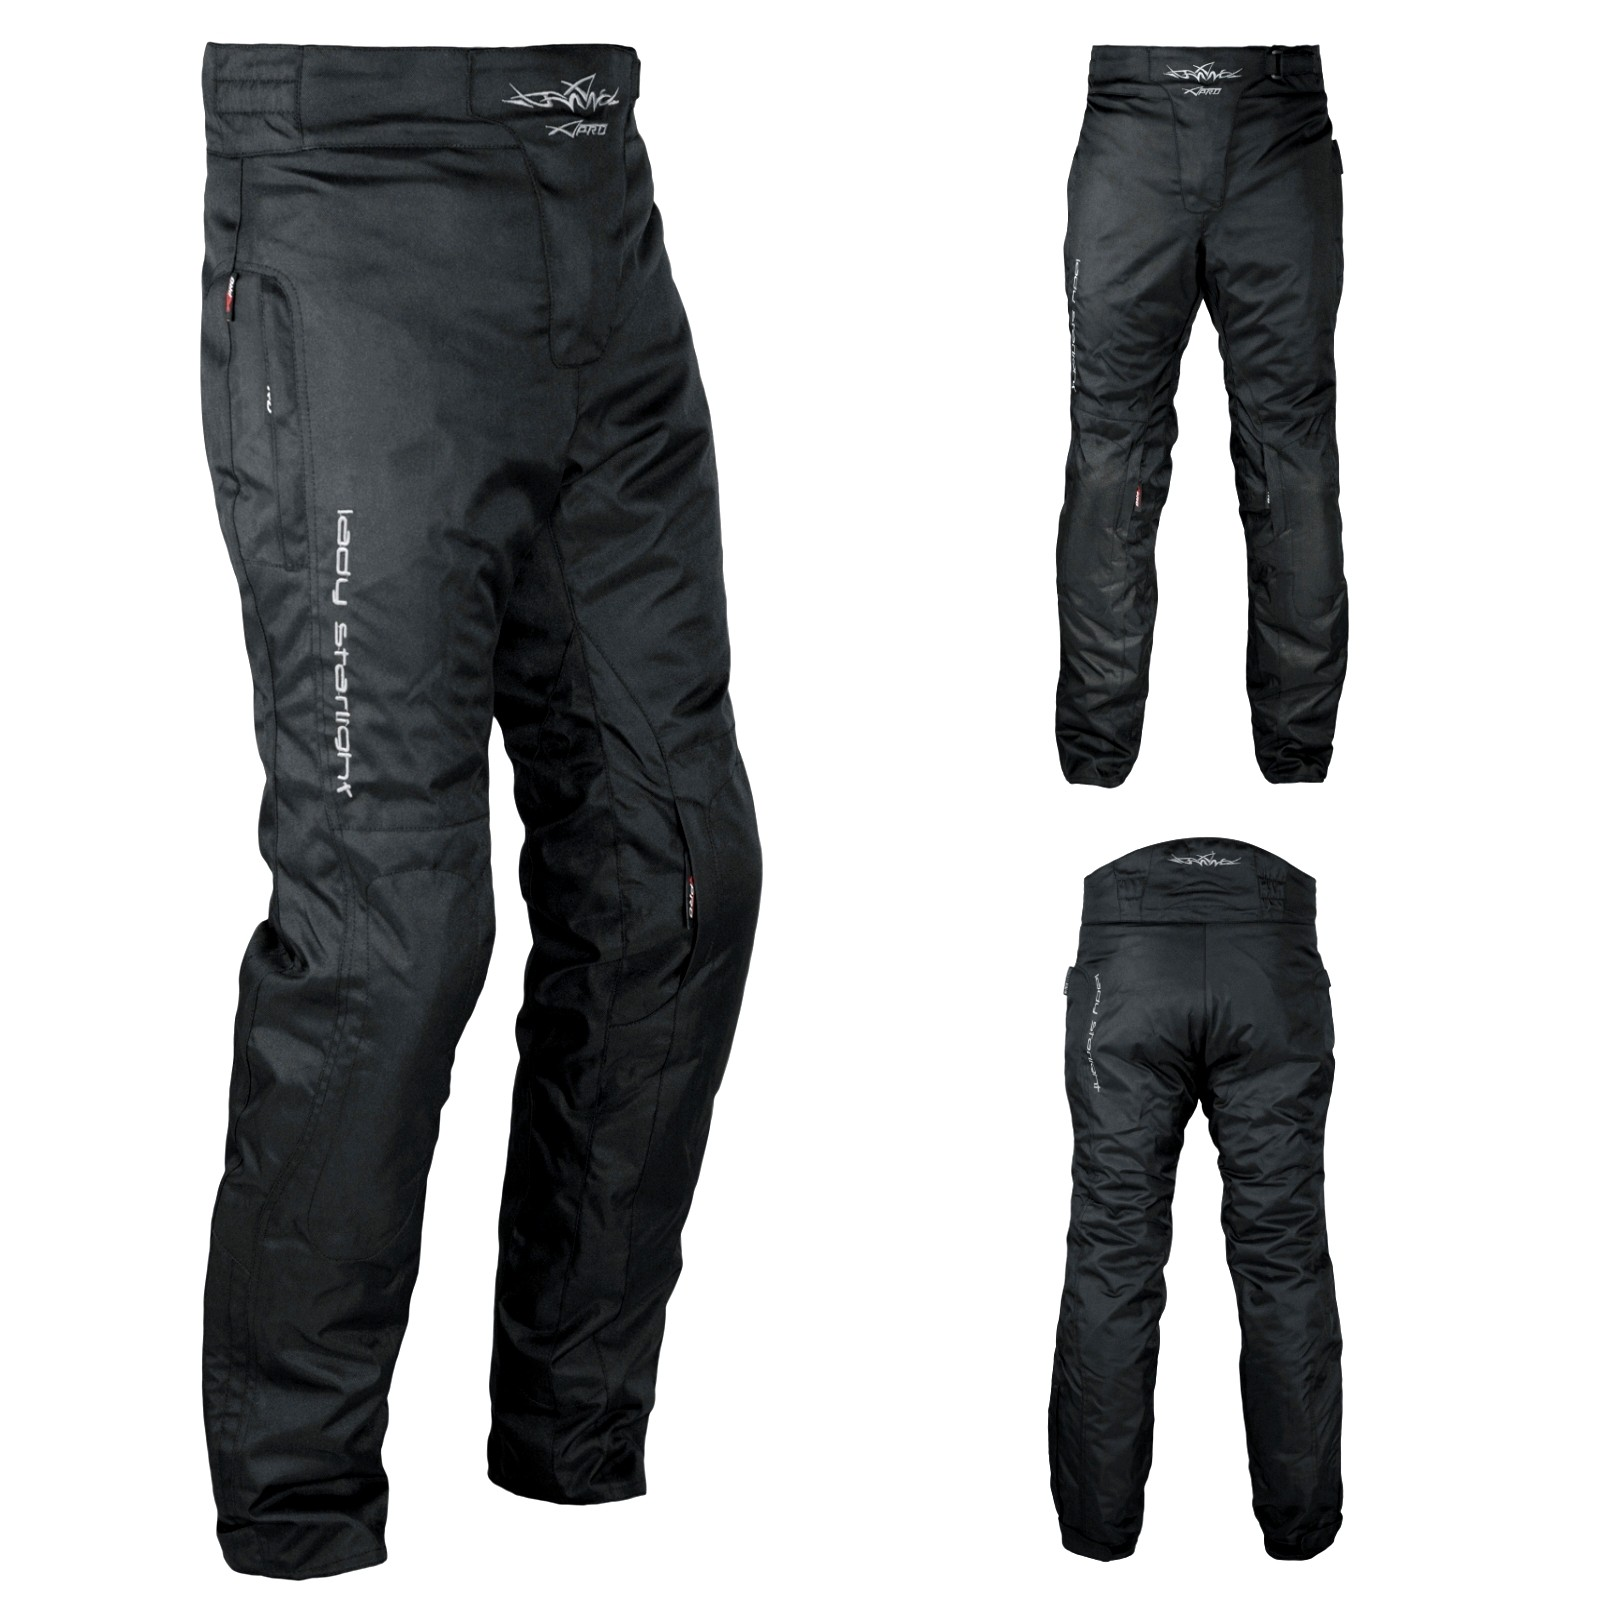 buy online 3d426 c190a Pantaloni Donna Moto Cordura Lady Protezioni CE Sfoderabile Impermeabile